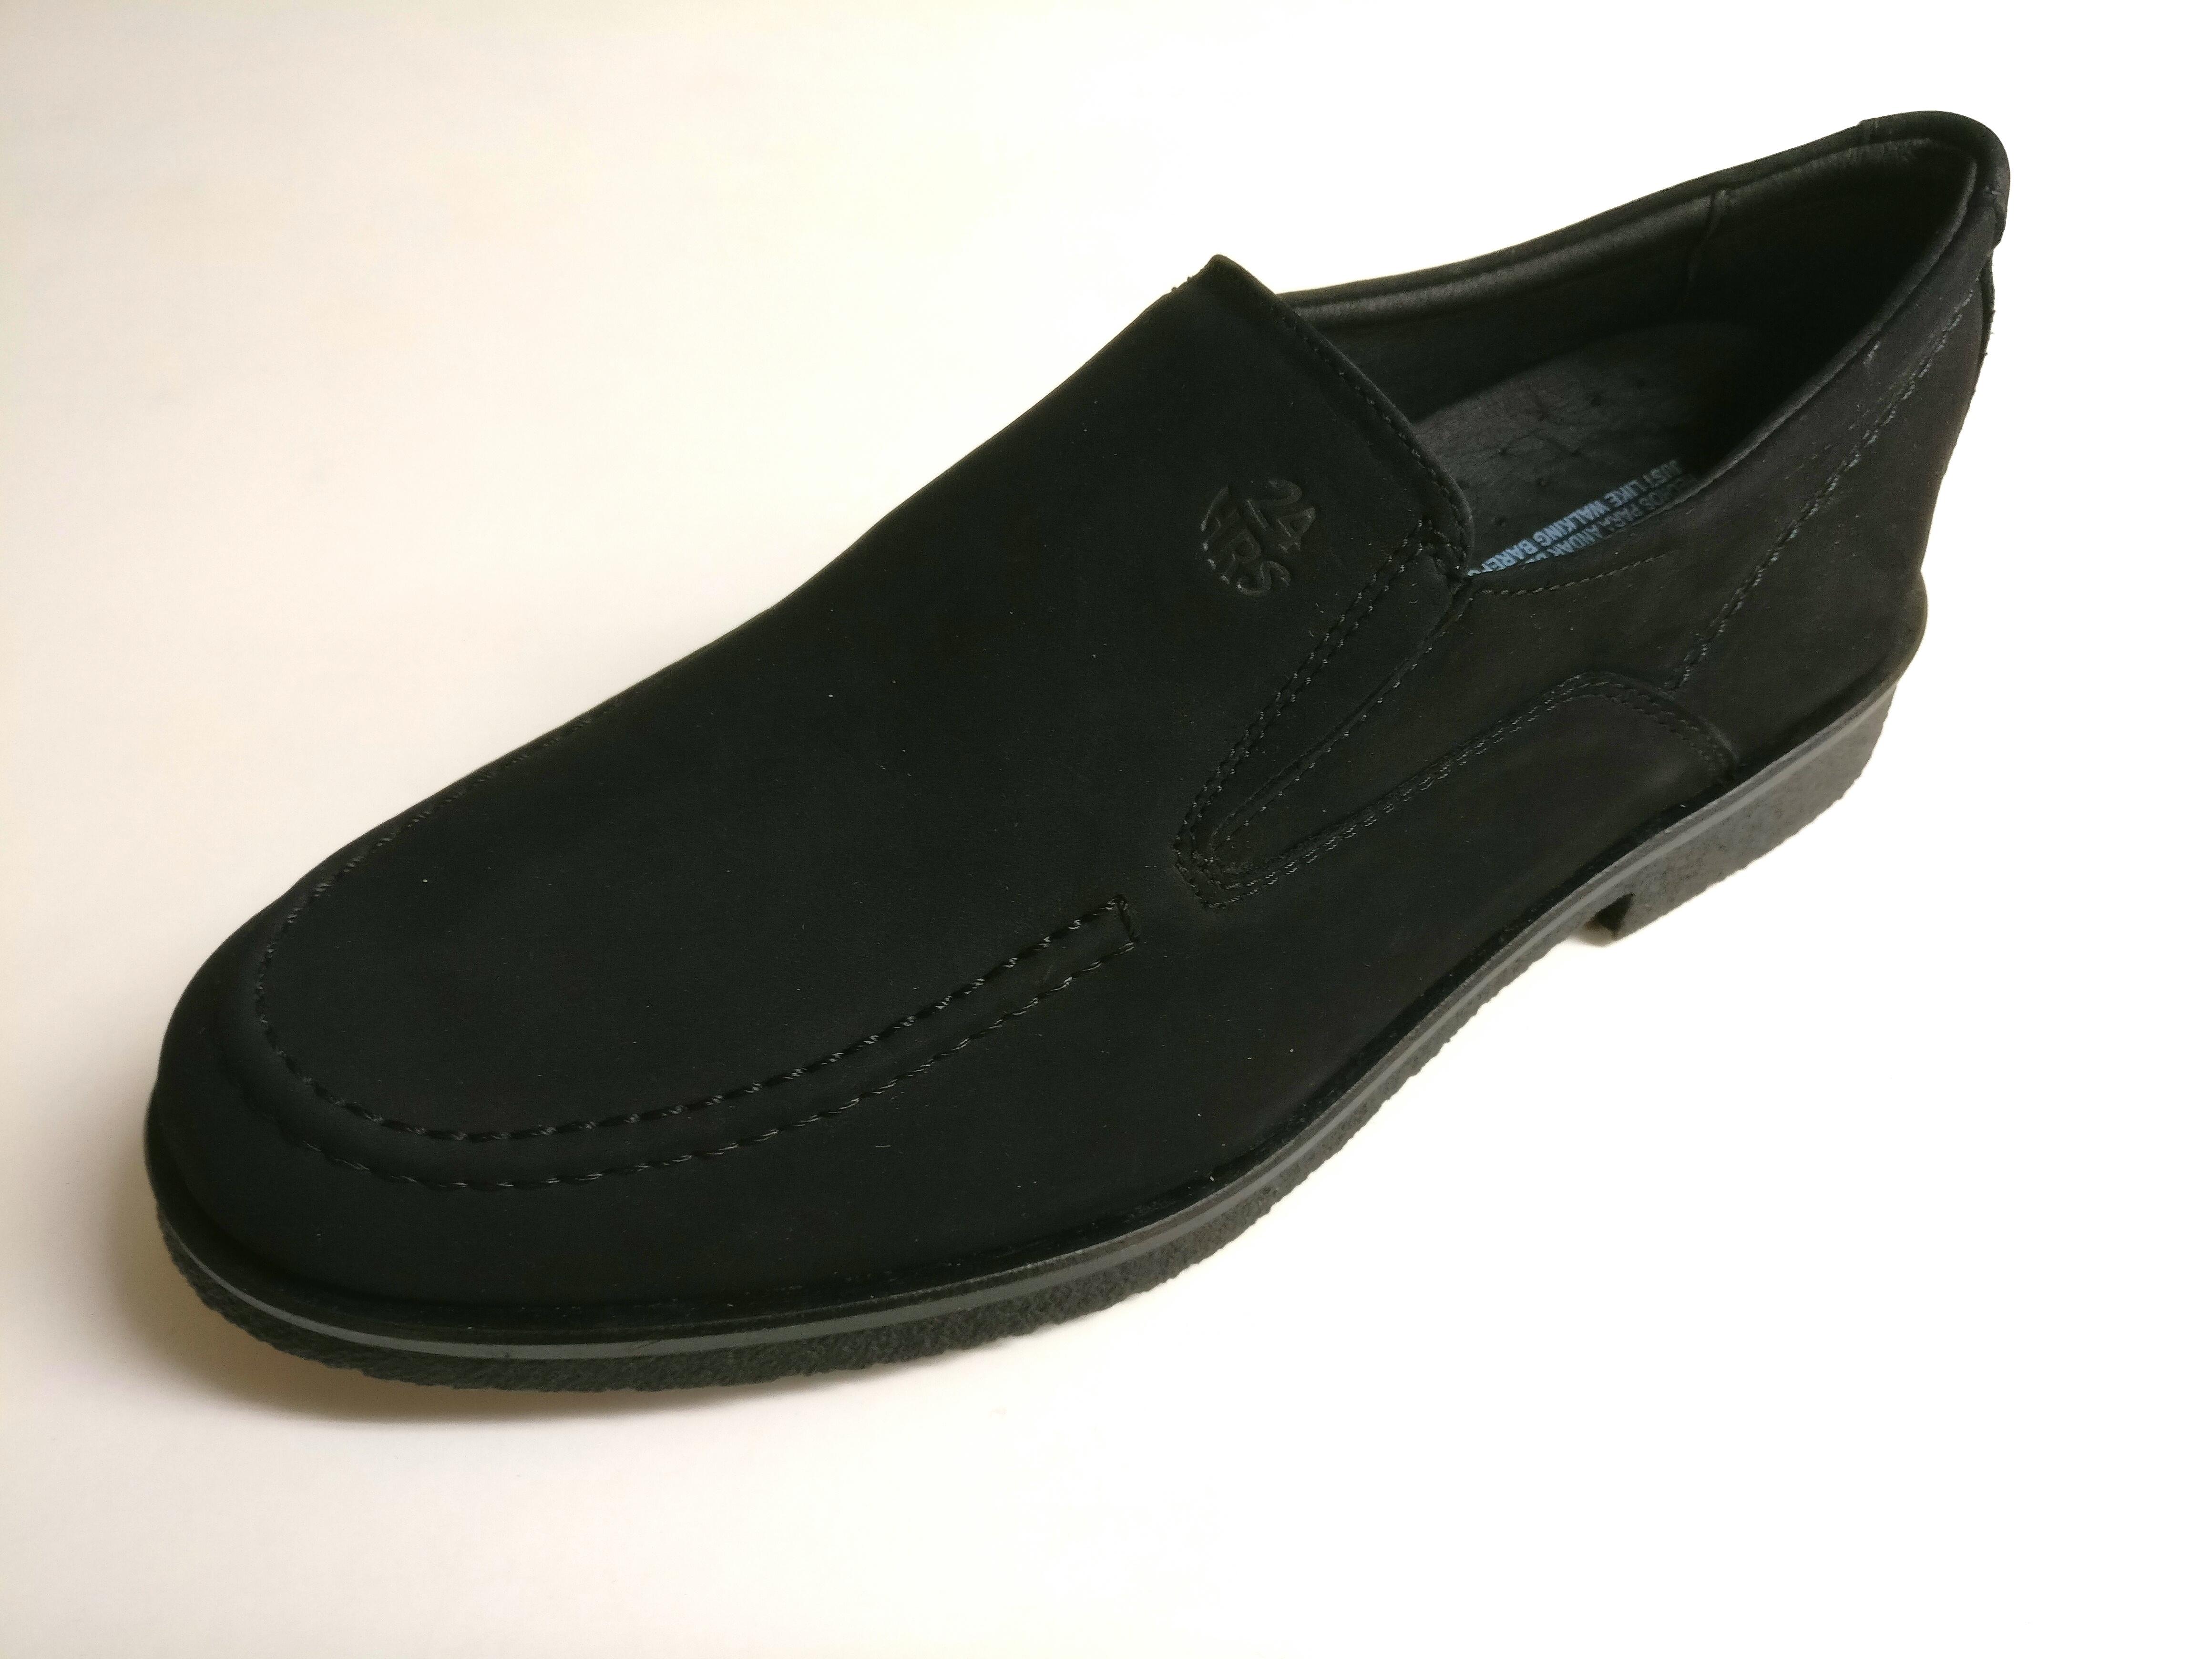 zapatos marca 24 Horas Mocasín hombre 10050 - Sabateries Montse Roig d839ab2a4073